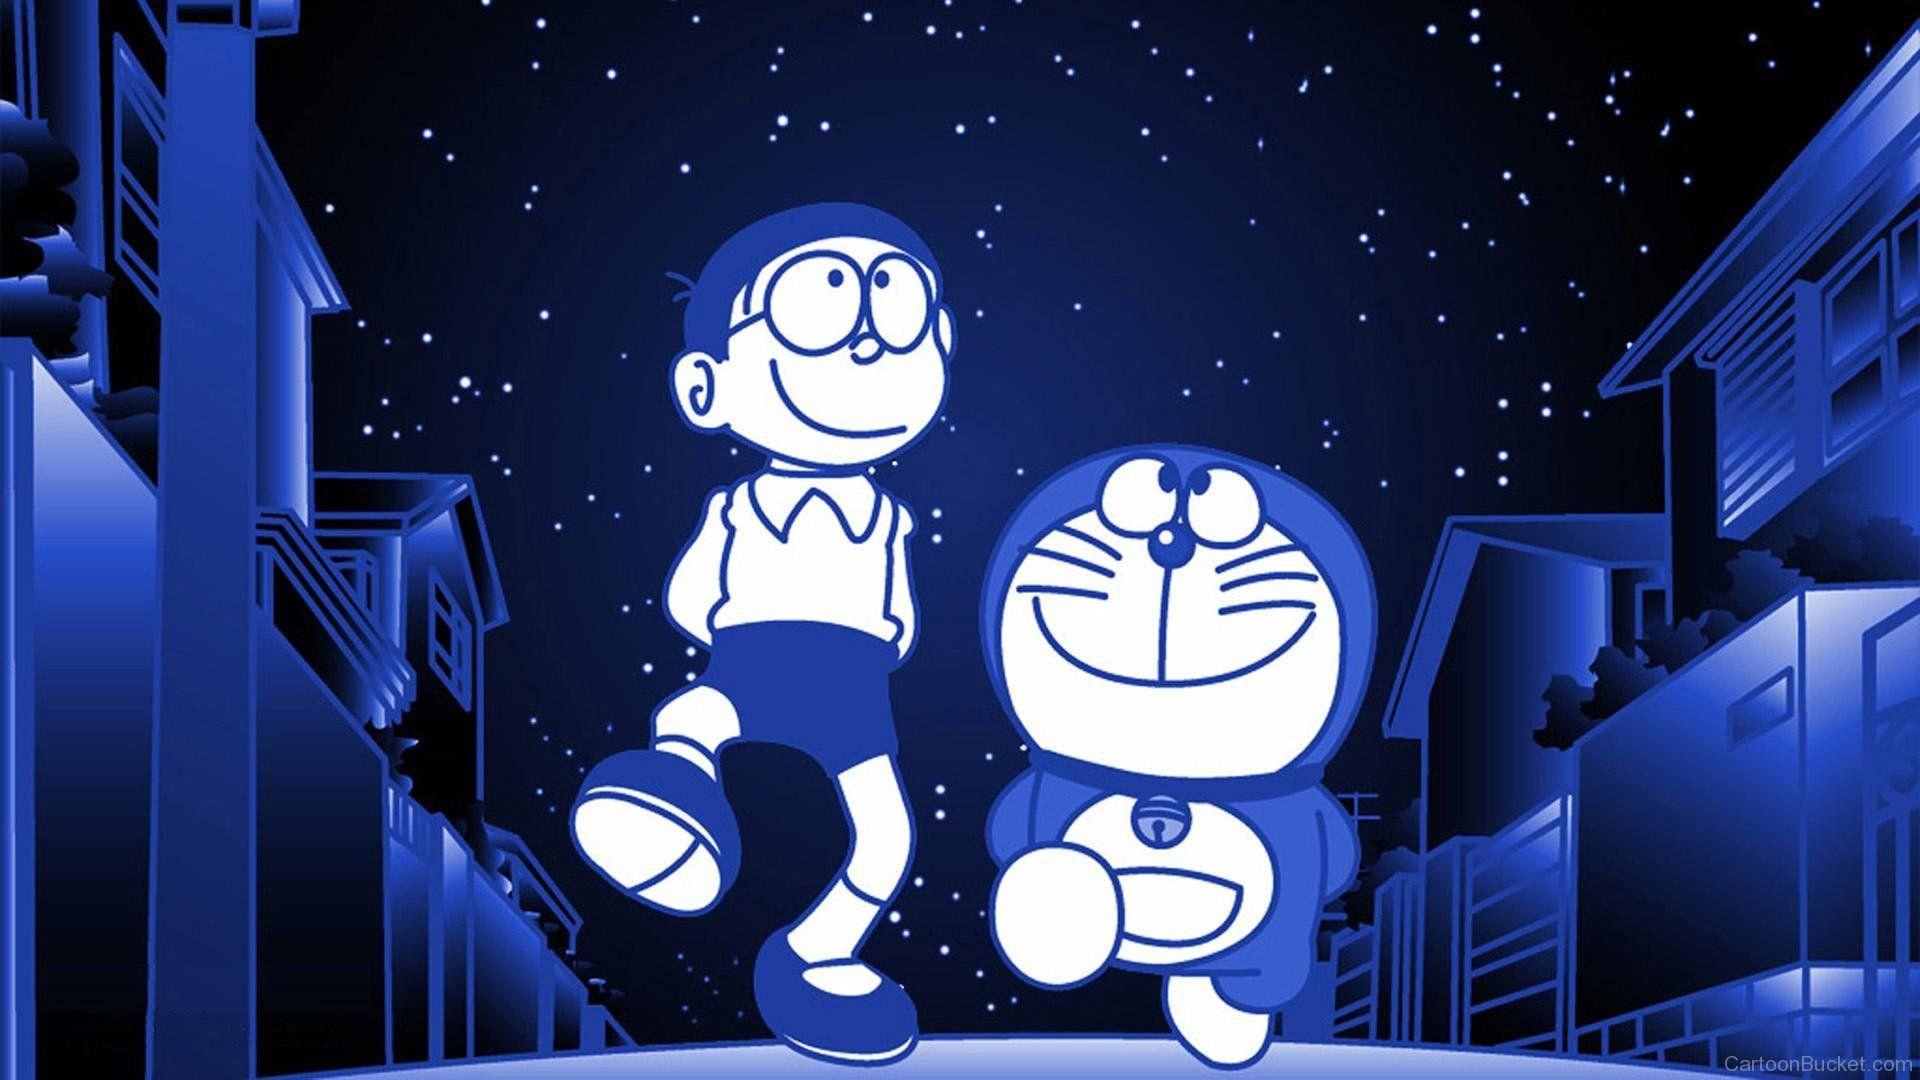 Wallpaper Doraemon Walking With Nobita In Midnight 漫画の壁紙